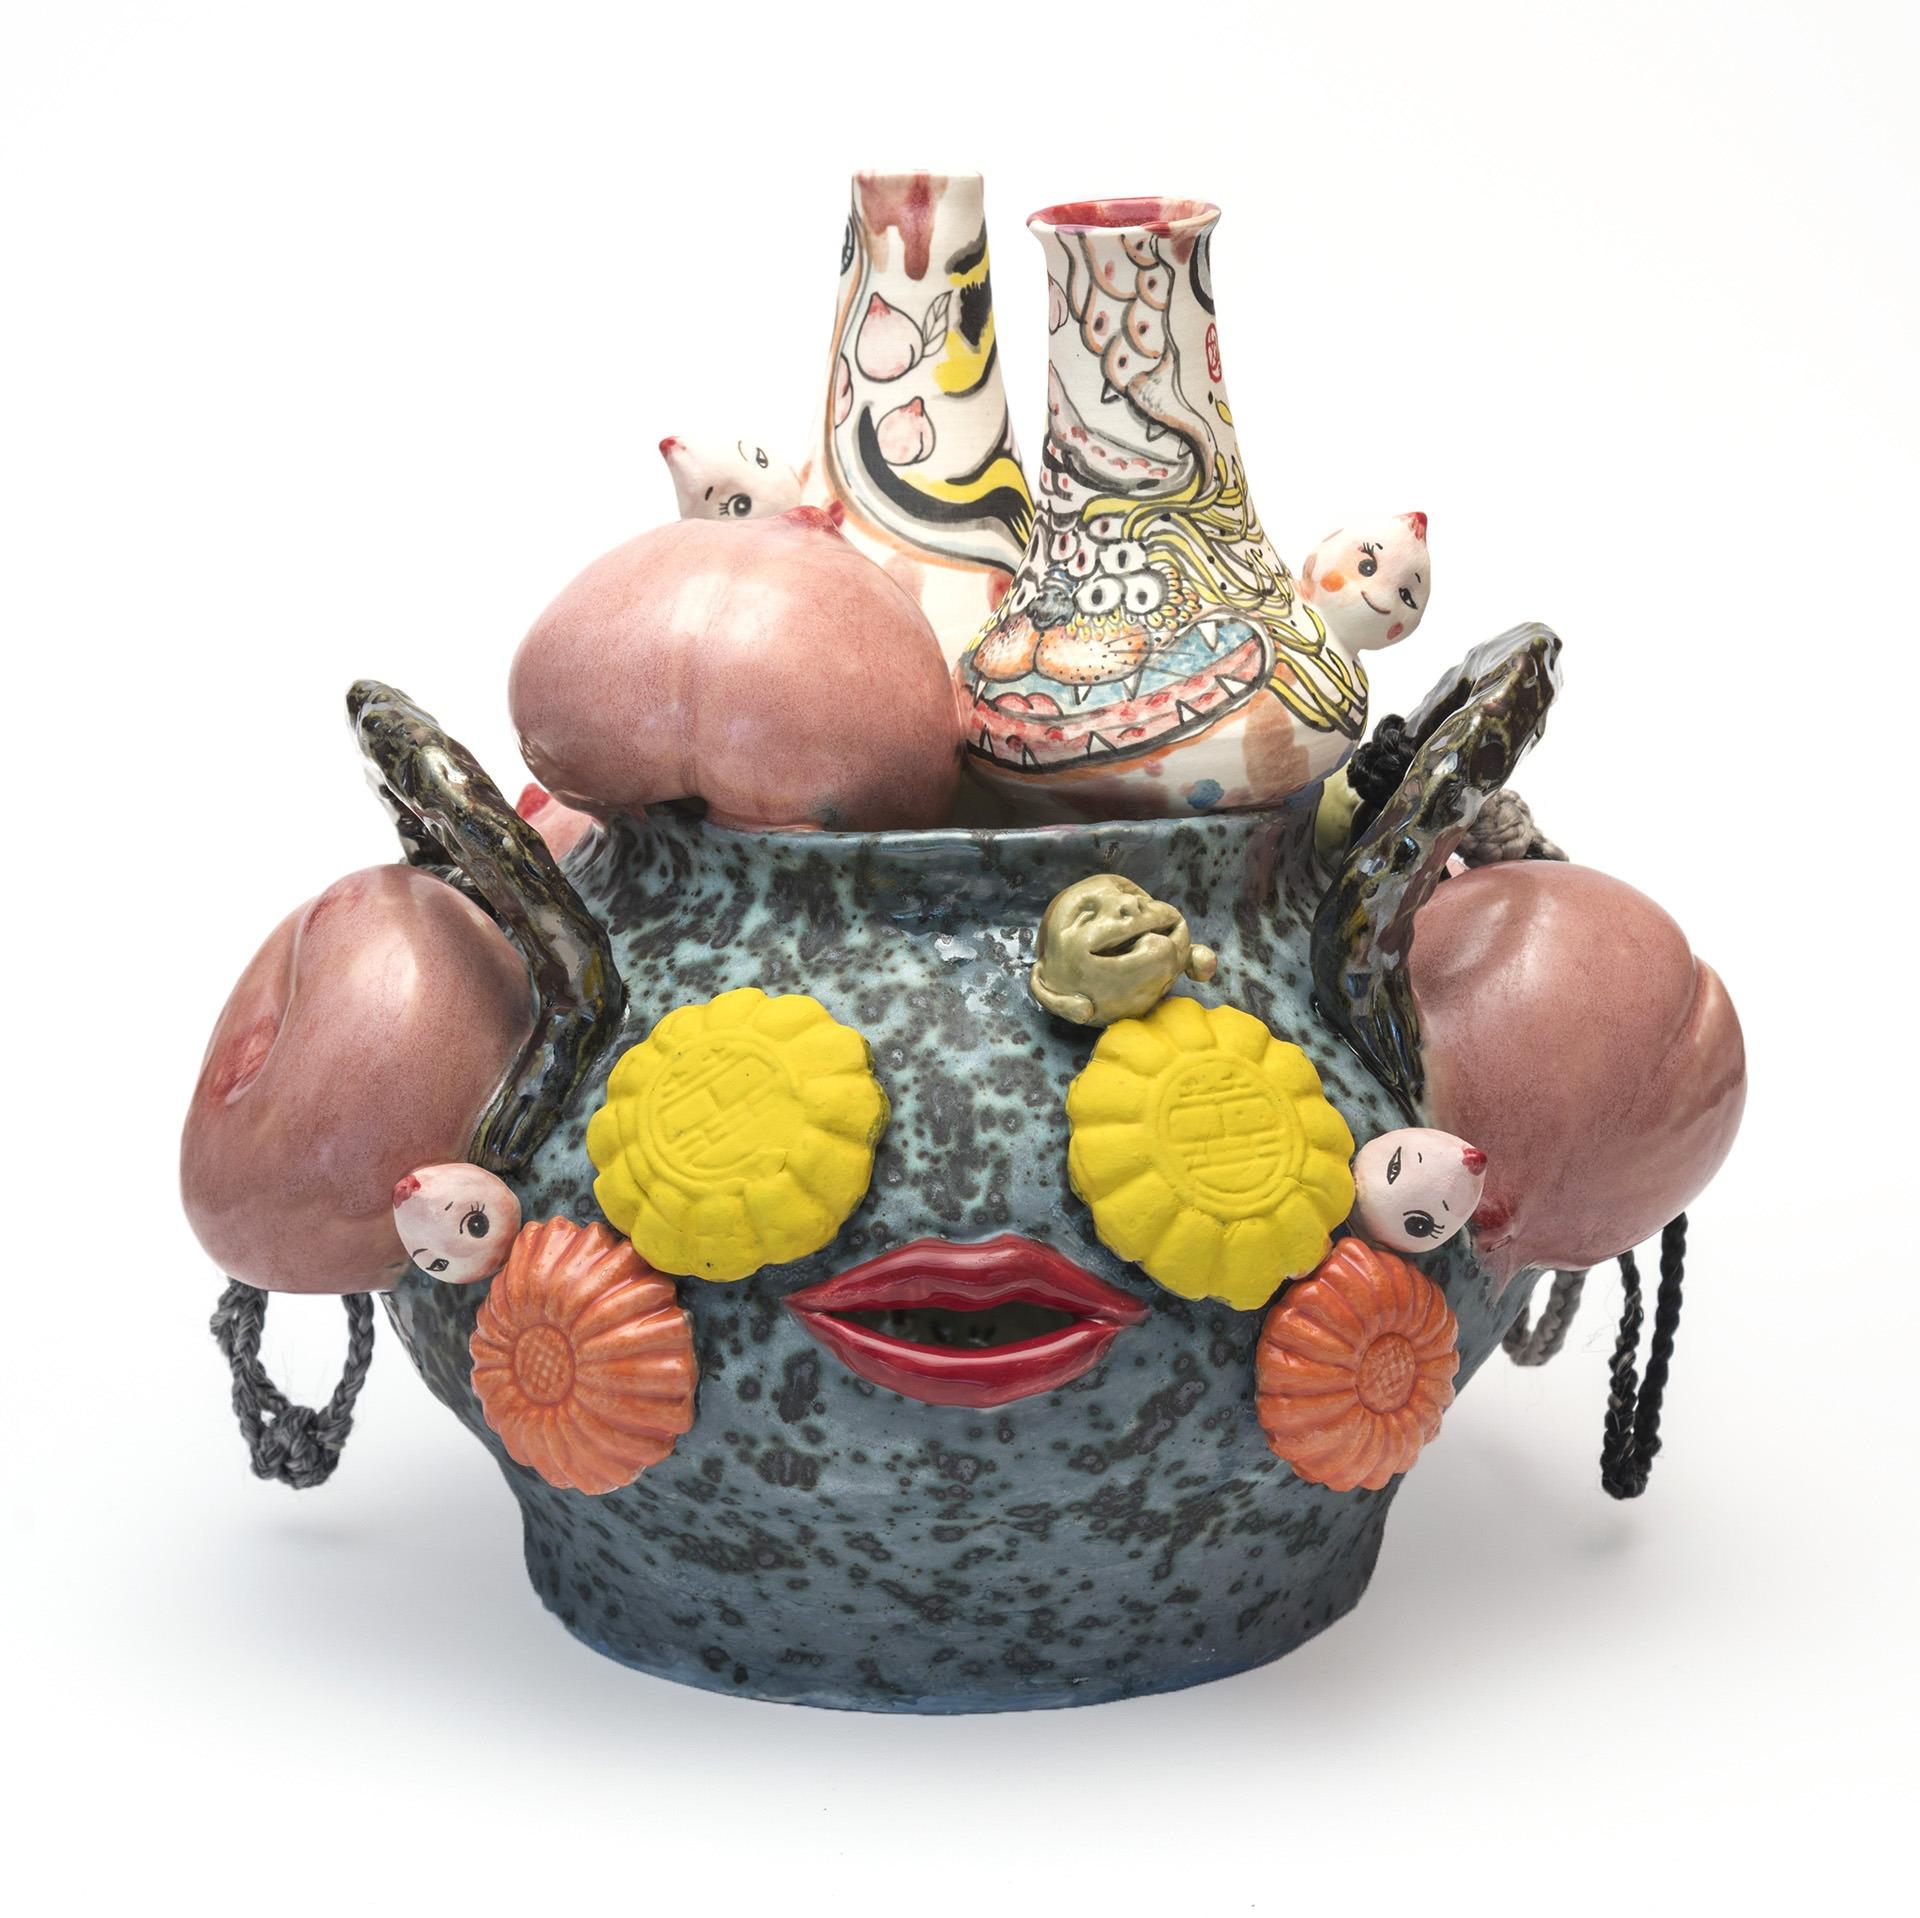 A sculpture by Jiha Moon titled Magic Halmae, dated 2021.